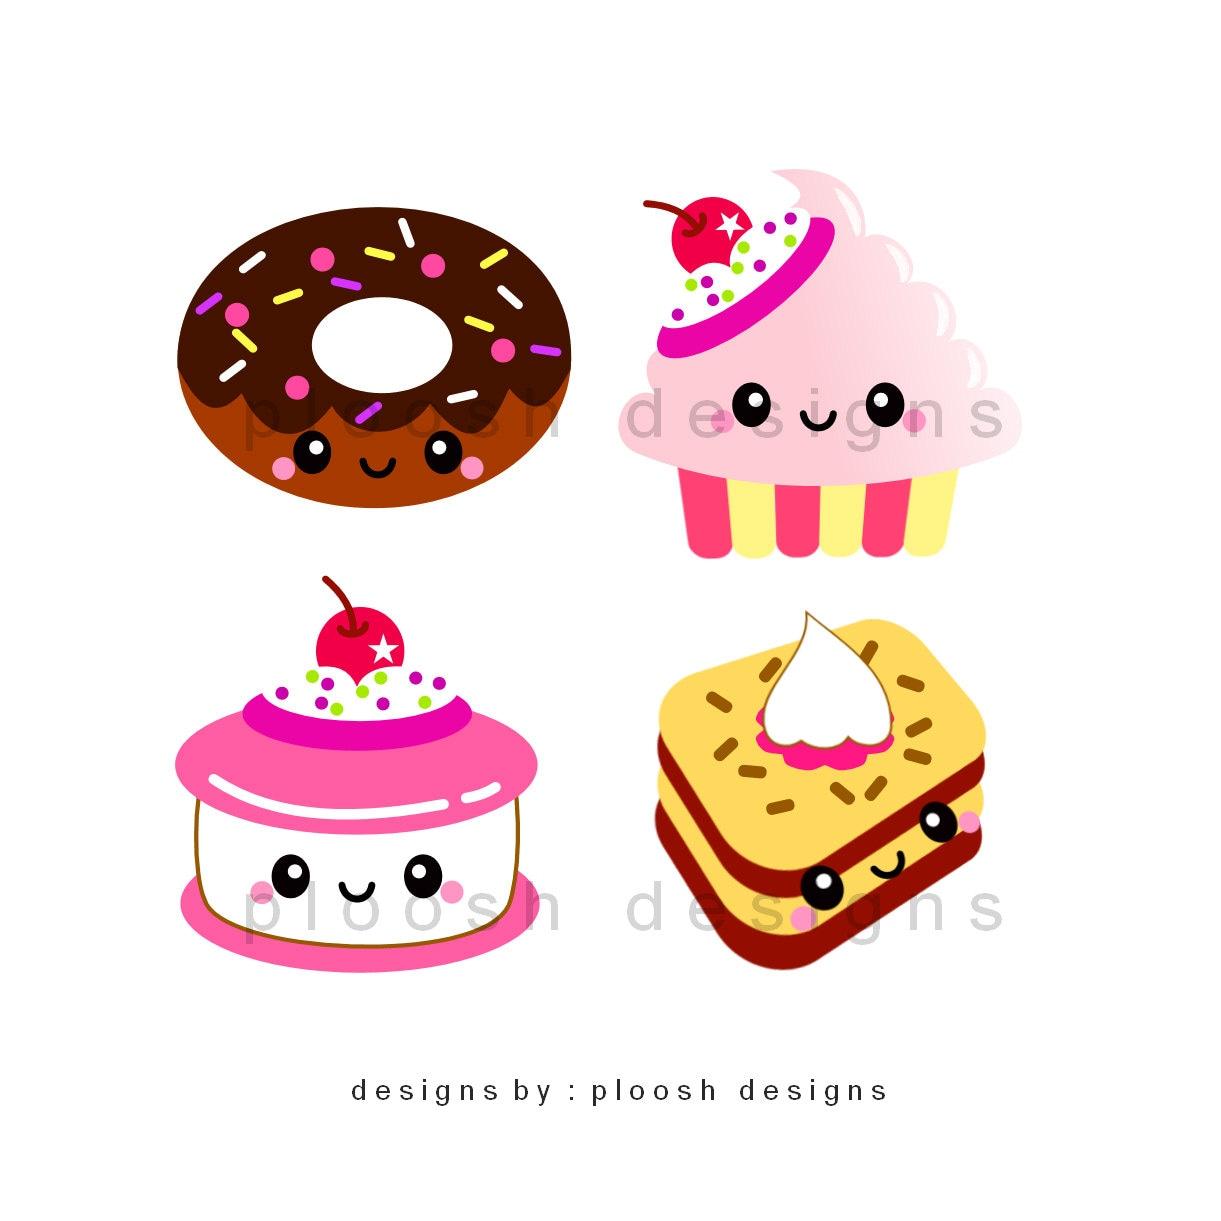 Stampe digitali di 4 dolci kawaii per biglietti tags for Immagini disegni kawaii